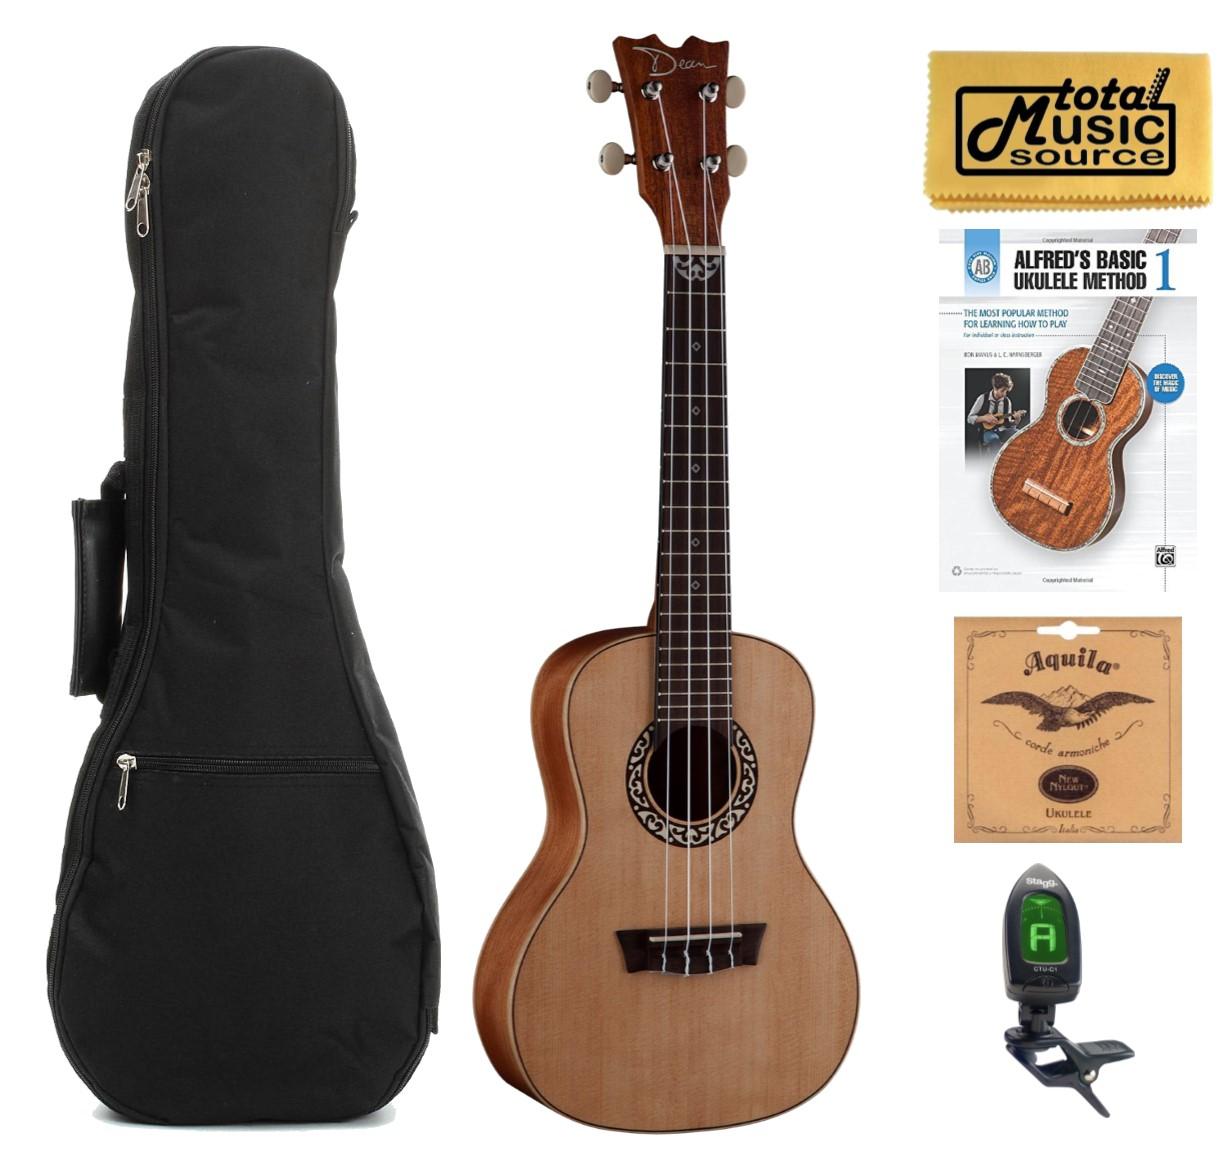 Dean Guitars Concert Spruce Ukulele, Satin Natural w/Padded Gigbag,Tuner,Strings,Book & PC ,UKEDCSPR COMPBK